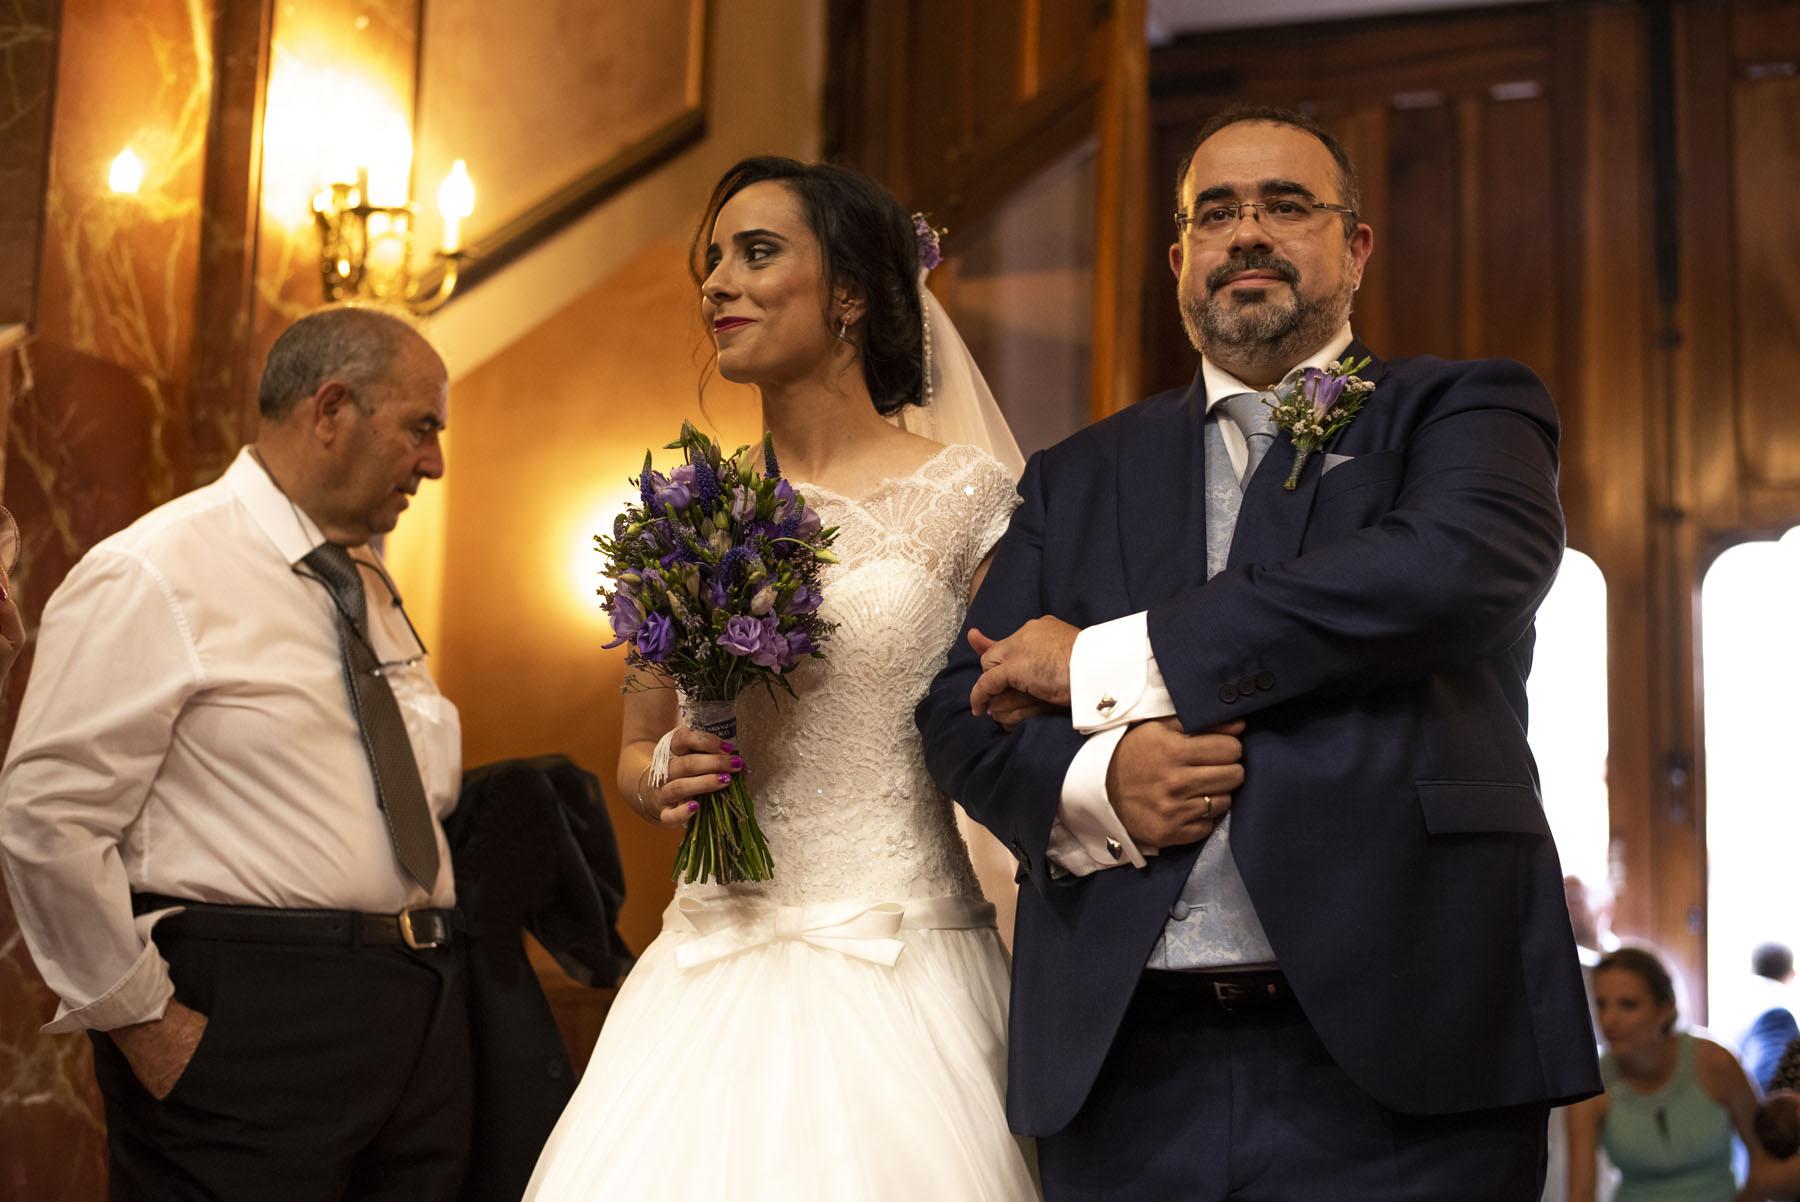 fotografo para bodas badajoz y caceres